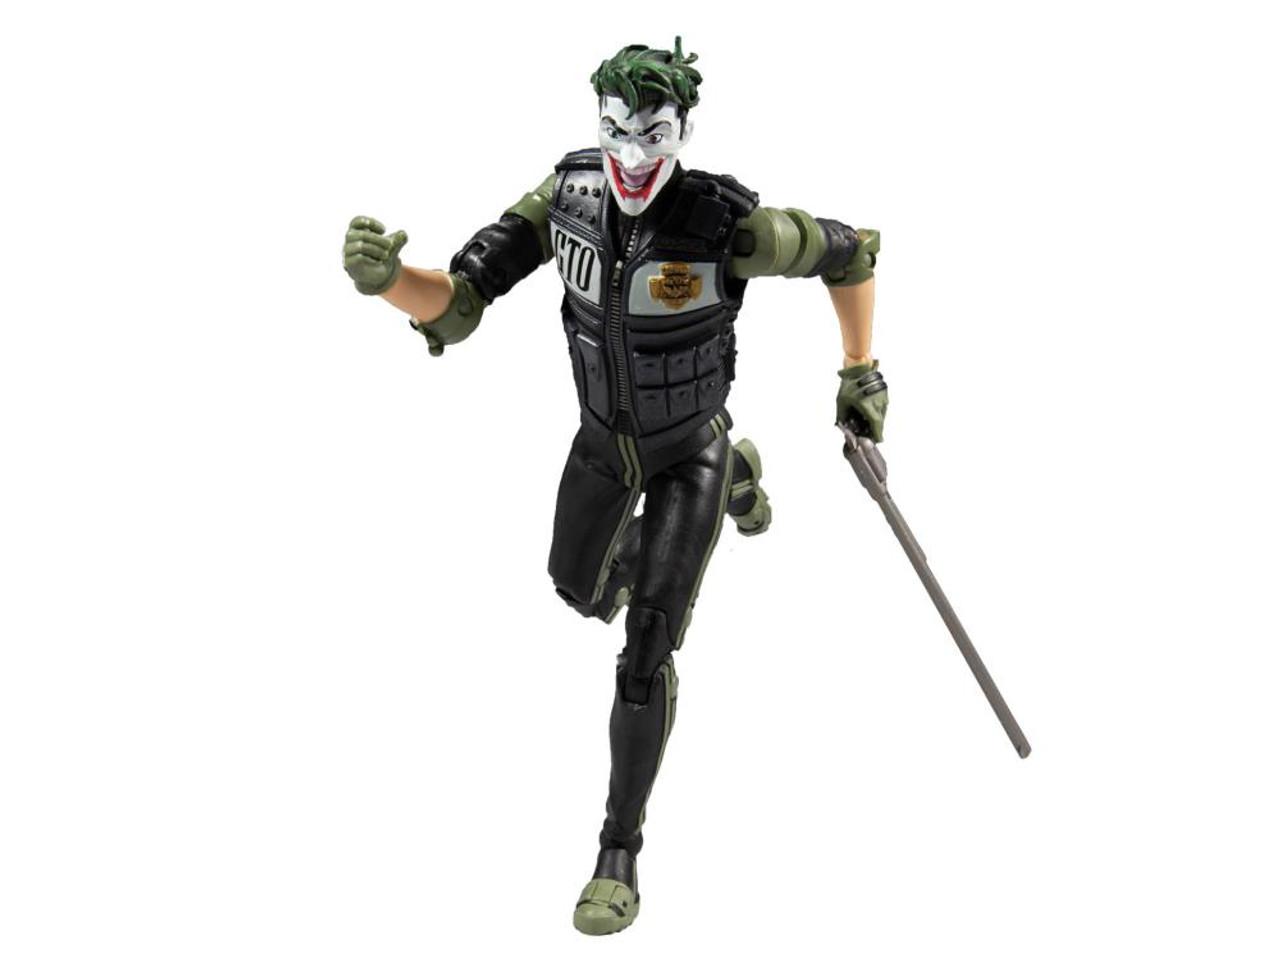 DC Multiverse Batman: The White Knight ~ The Joker (Jack Napier) Action Figure